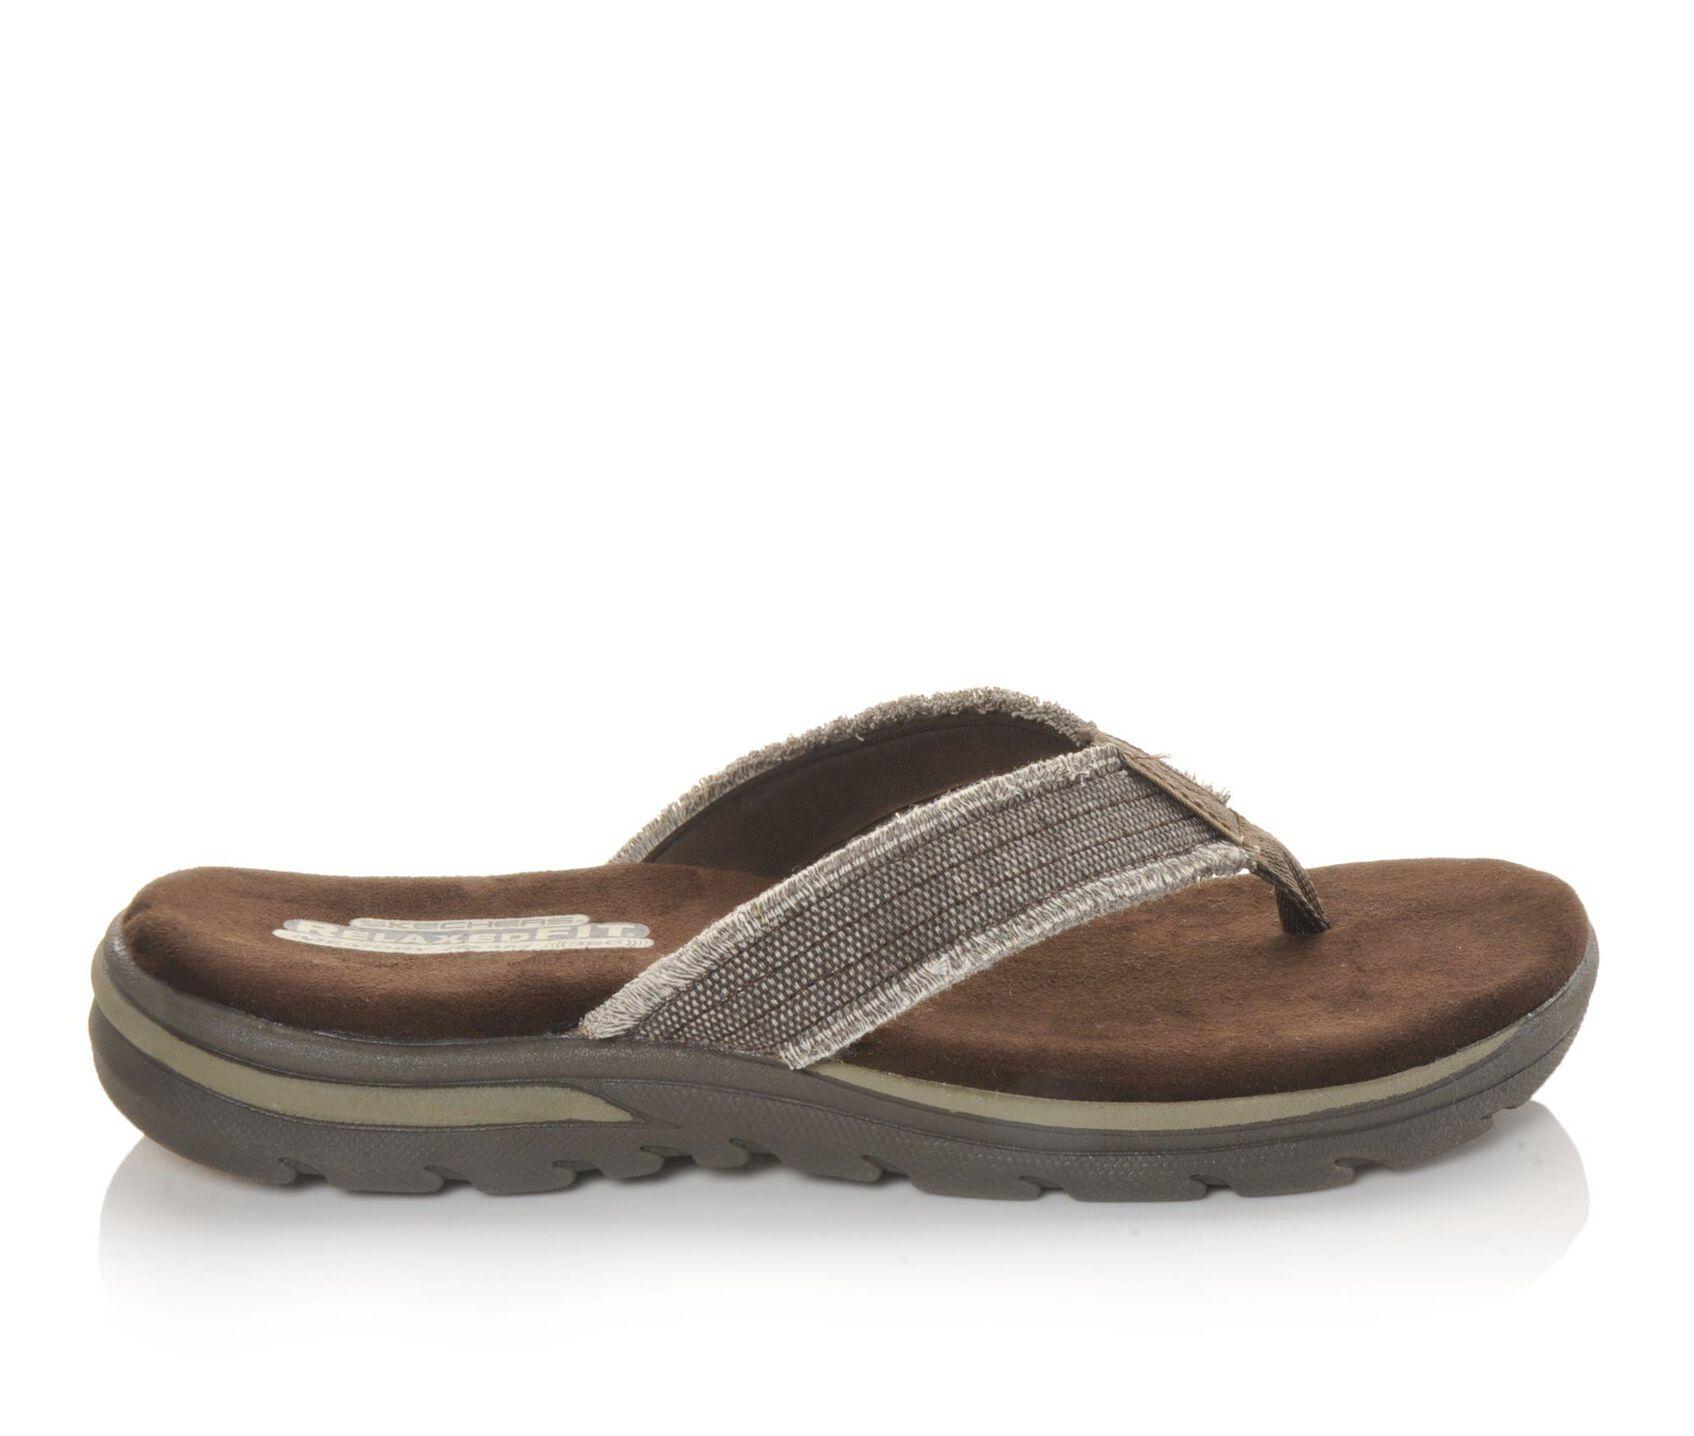 87de95c1d28a ... Skechers Bosnia 64152 Flip-Flops. Previous